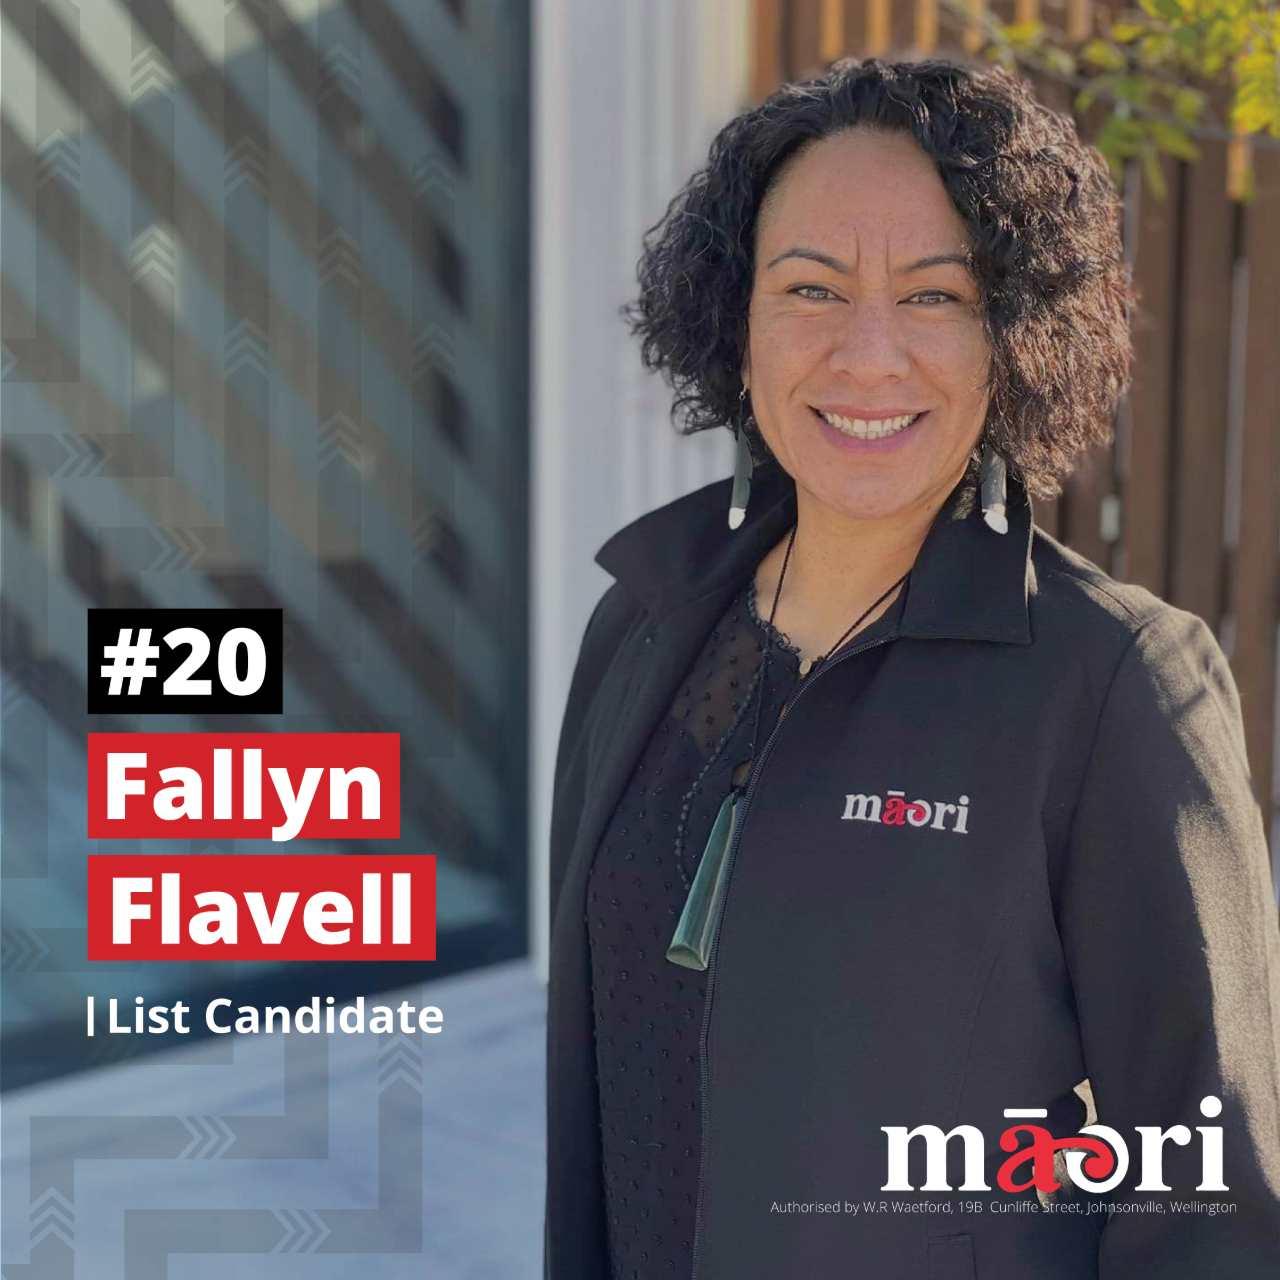 Fallyn Flavell, List Candidate